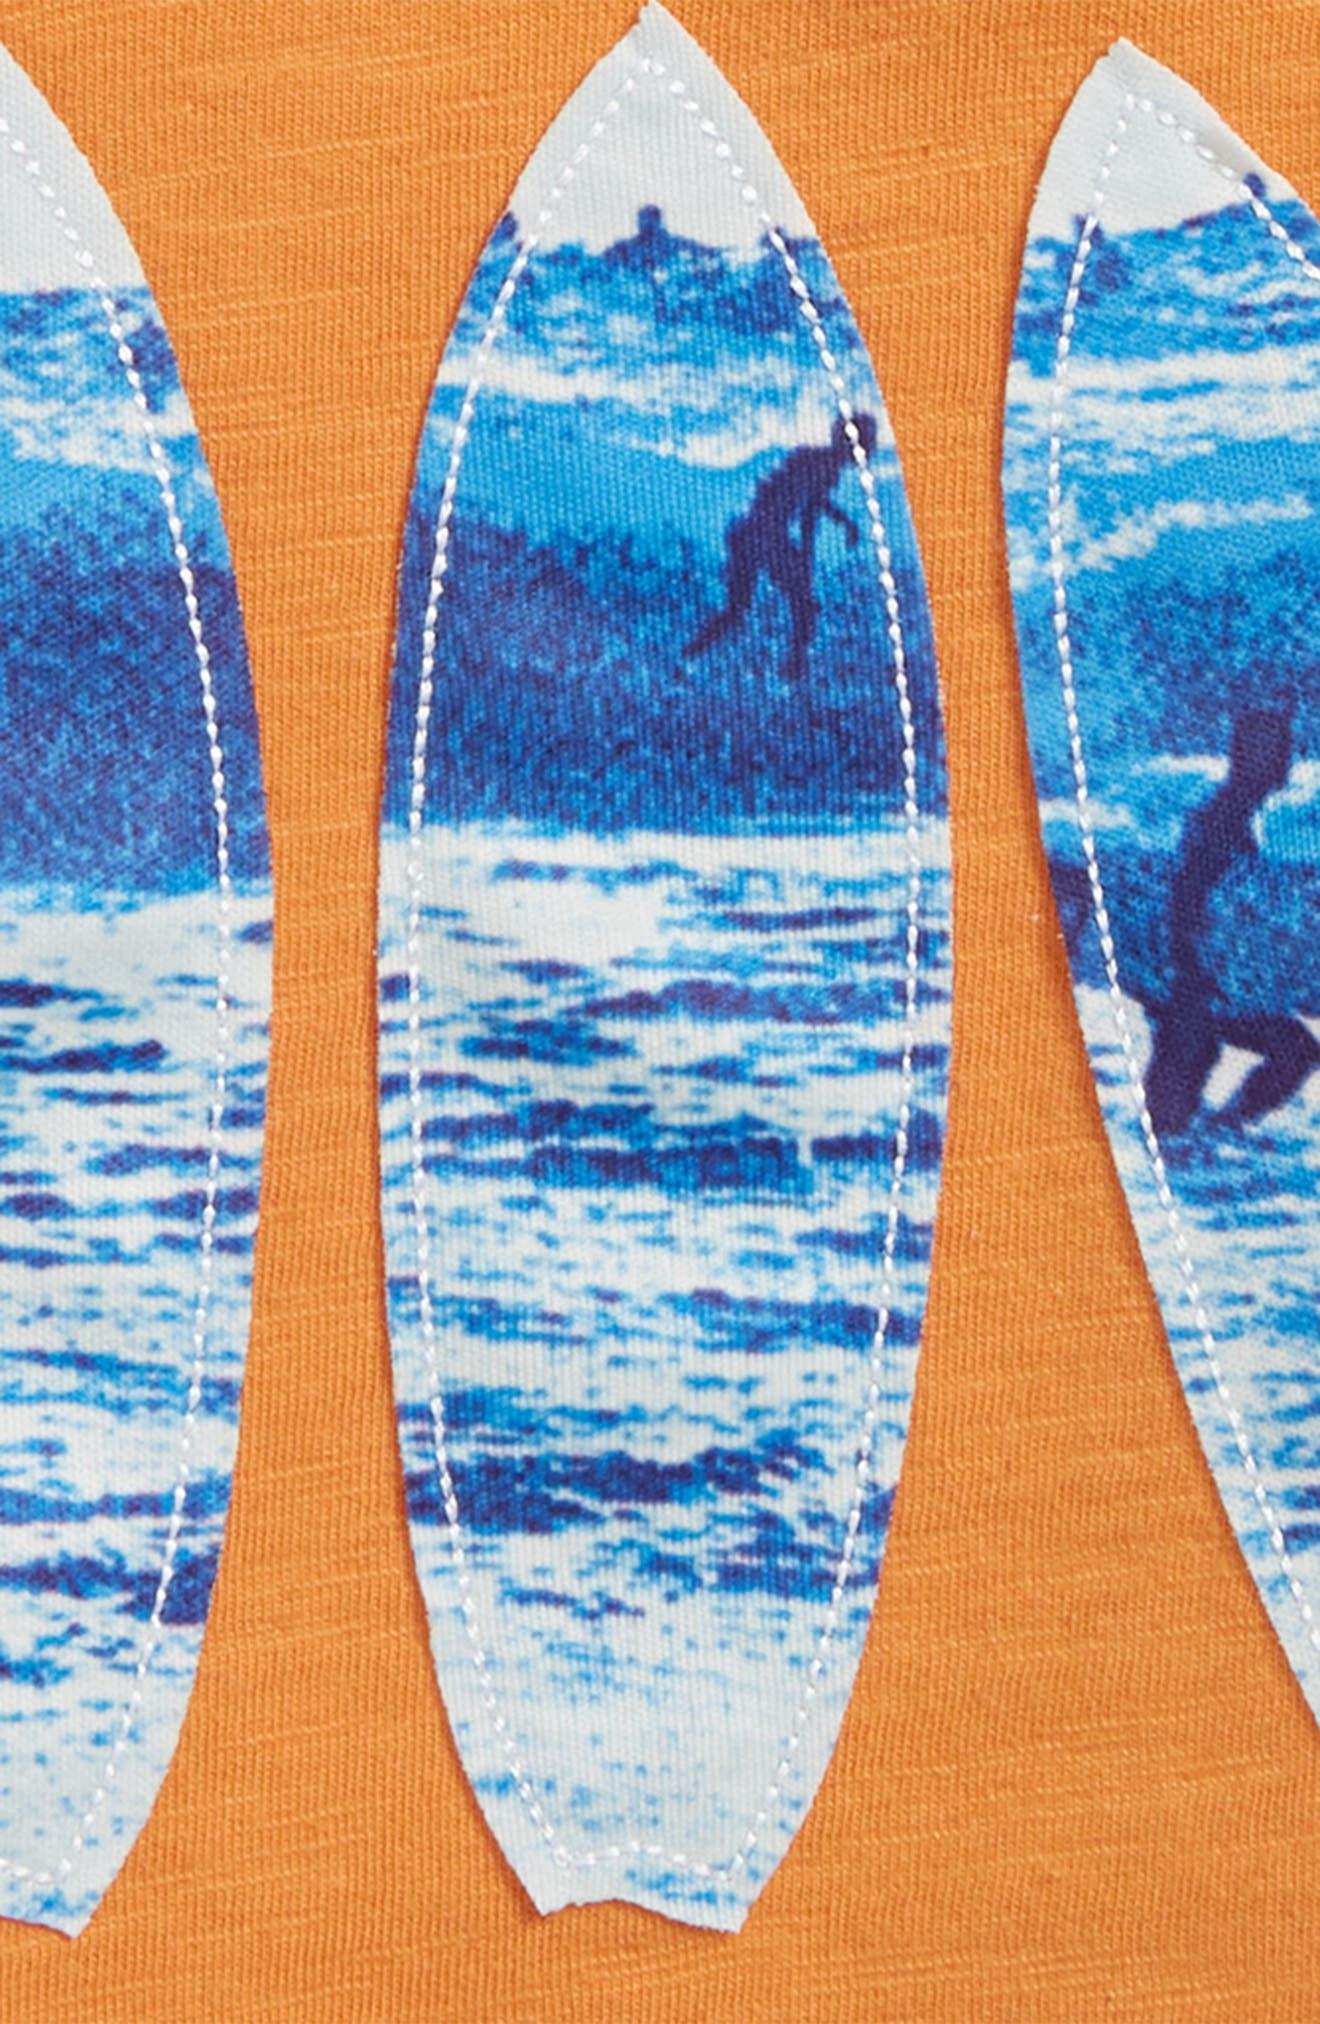 Alternate Image 2  - Tucker + Tate Surfboard Appliqué T-Shirt (Baby)